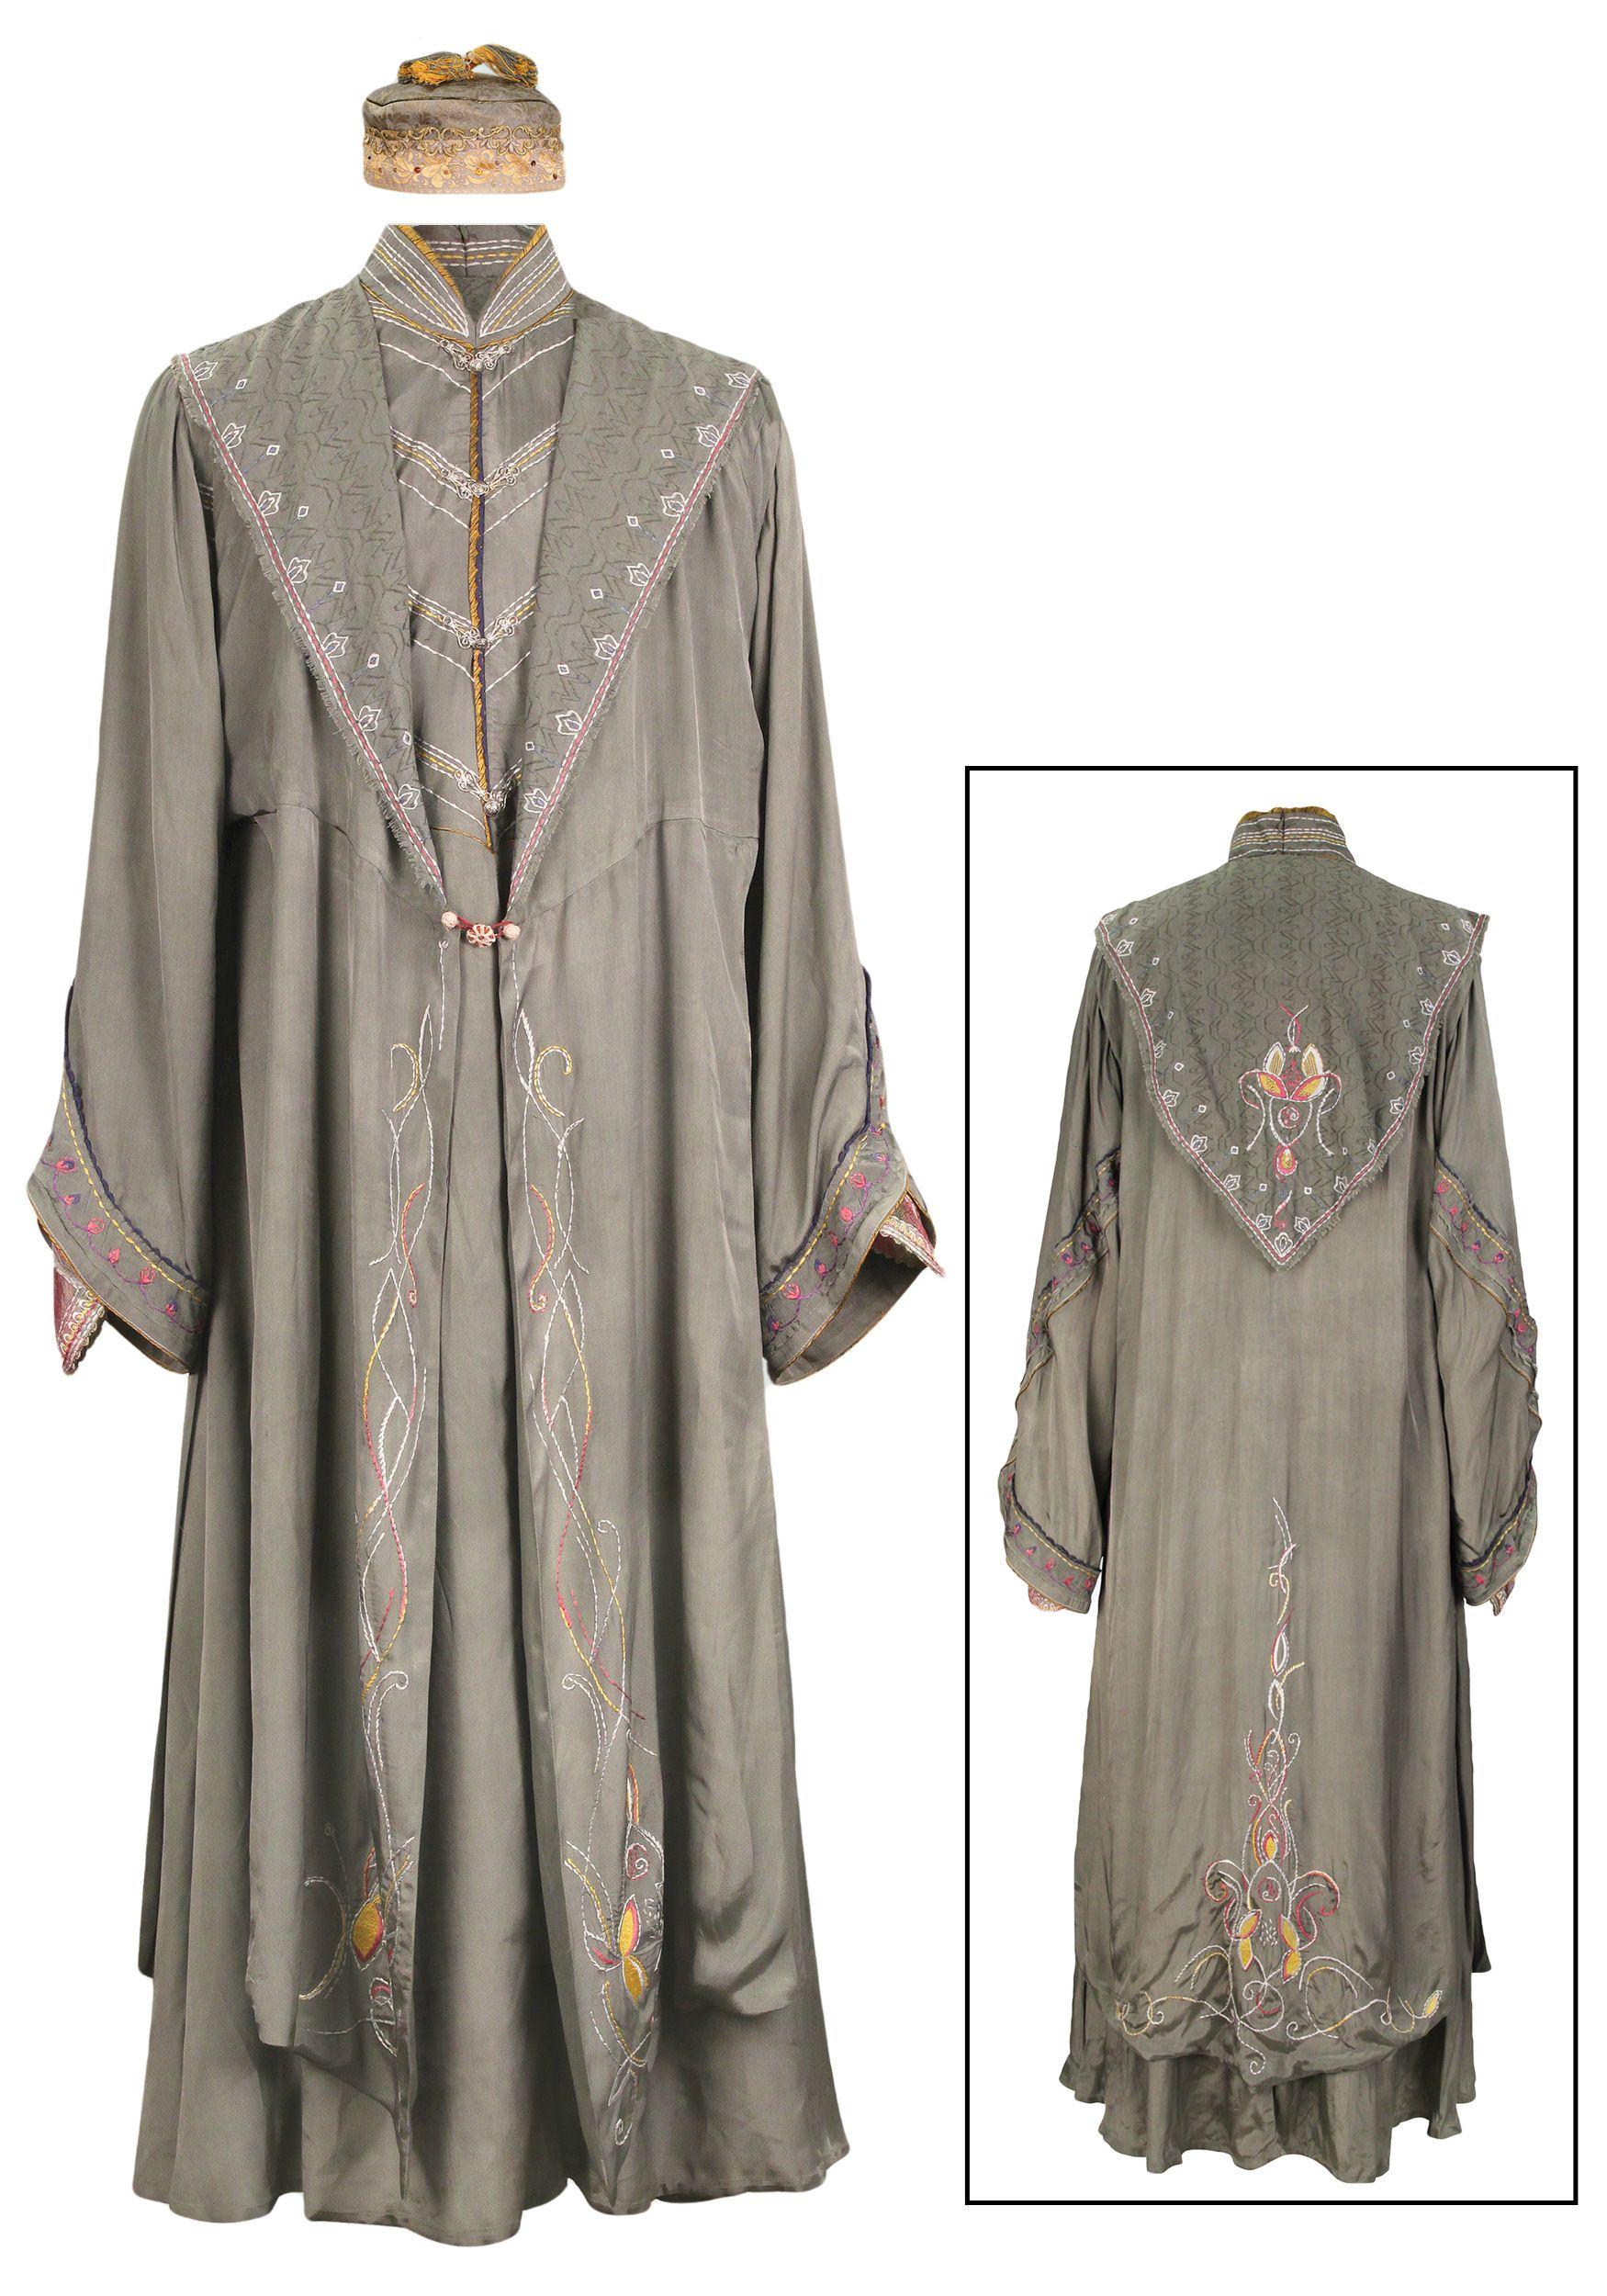 Replica Dumbledore Costume | Harry Potter | Pinterest | Fantasy ...